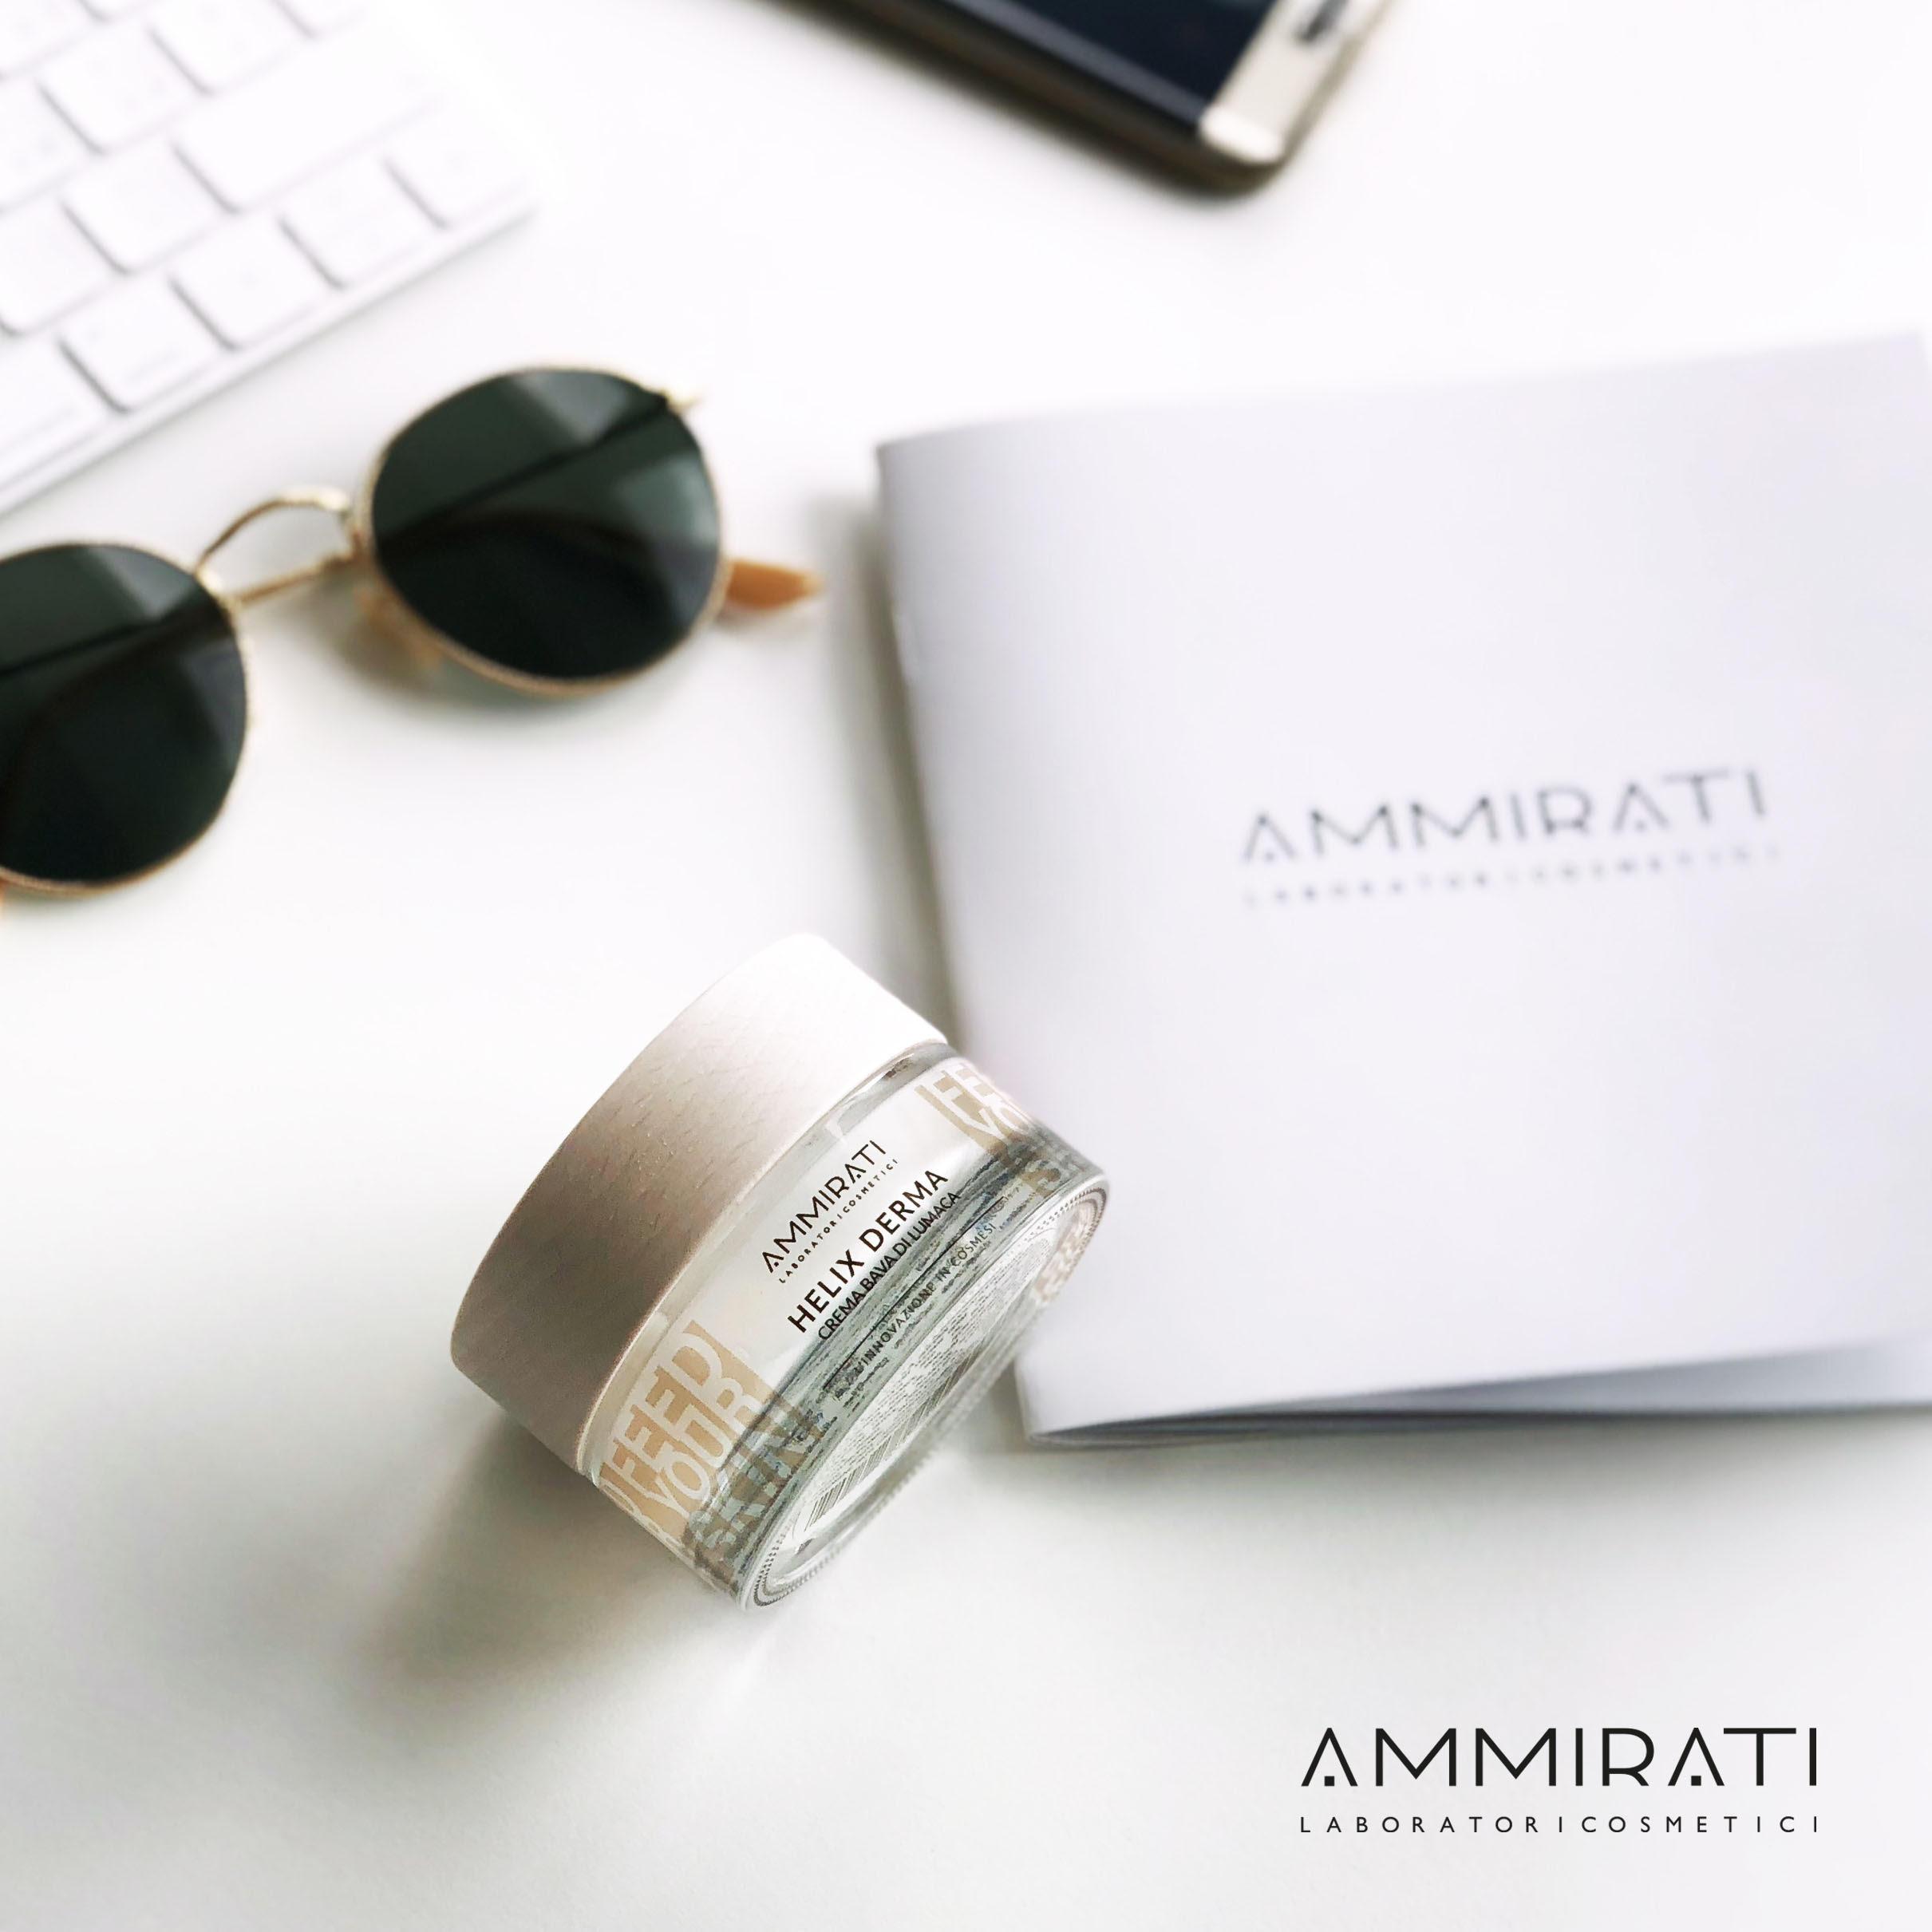 Helix Derma - Ammirati Cosmetici